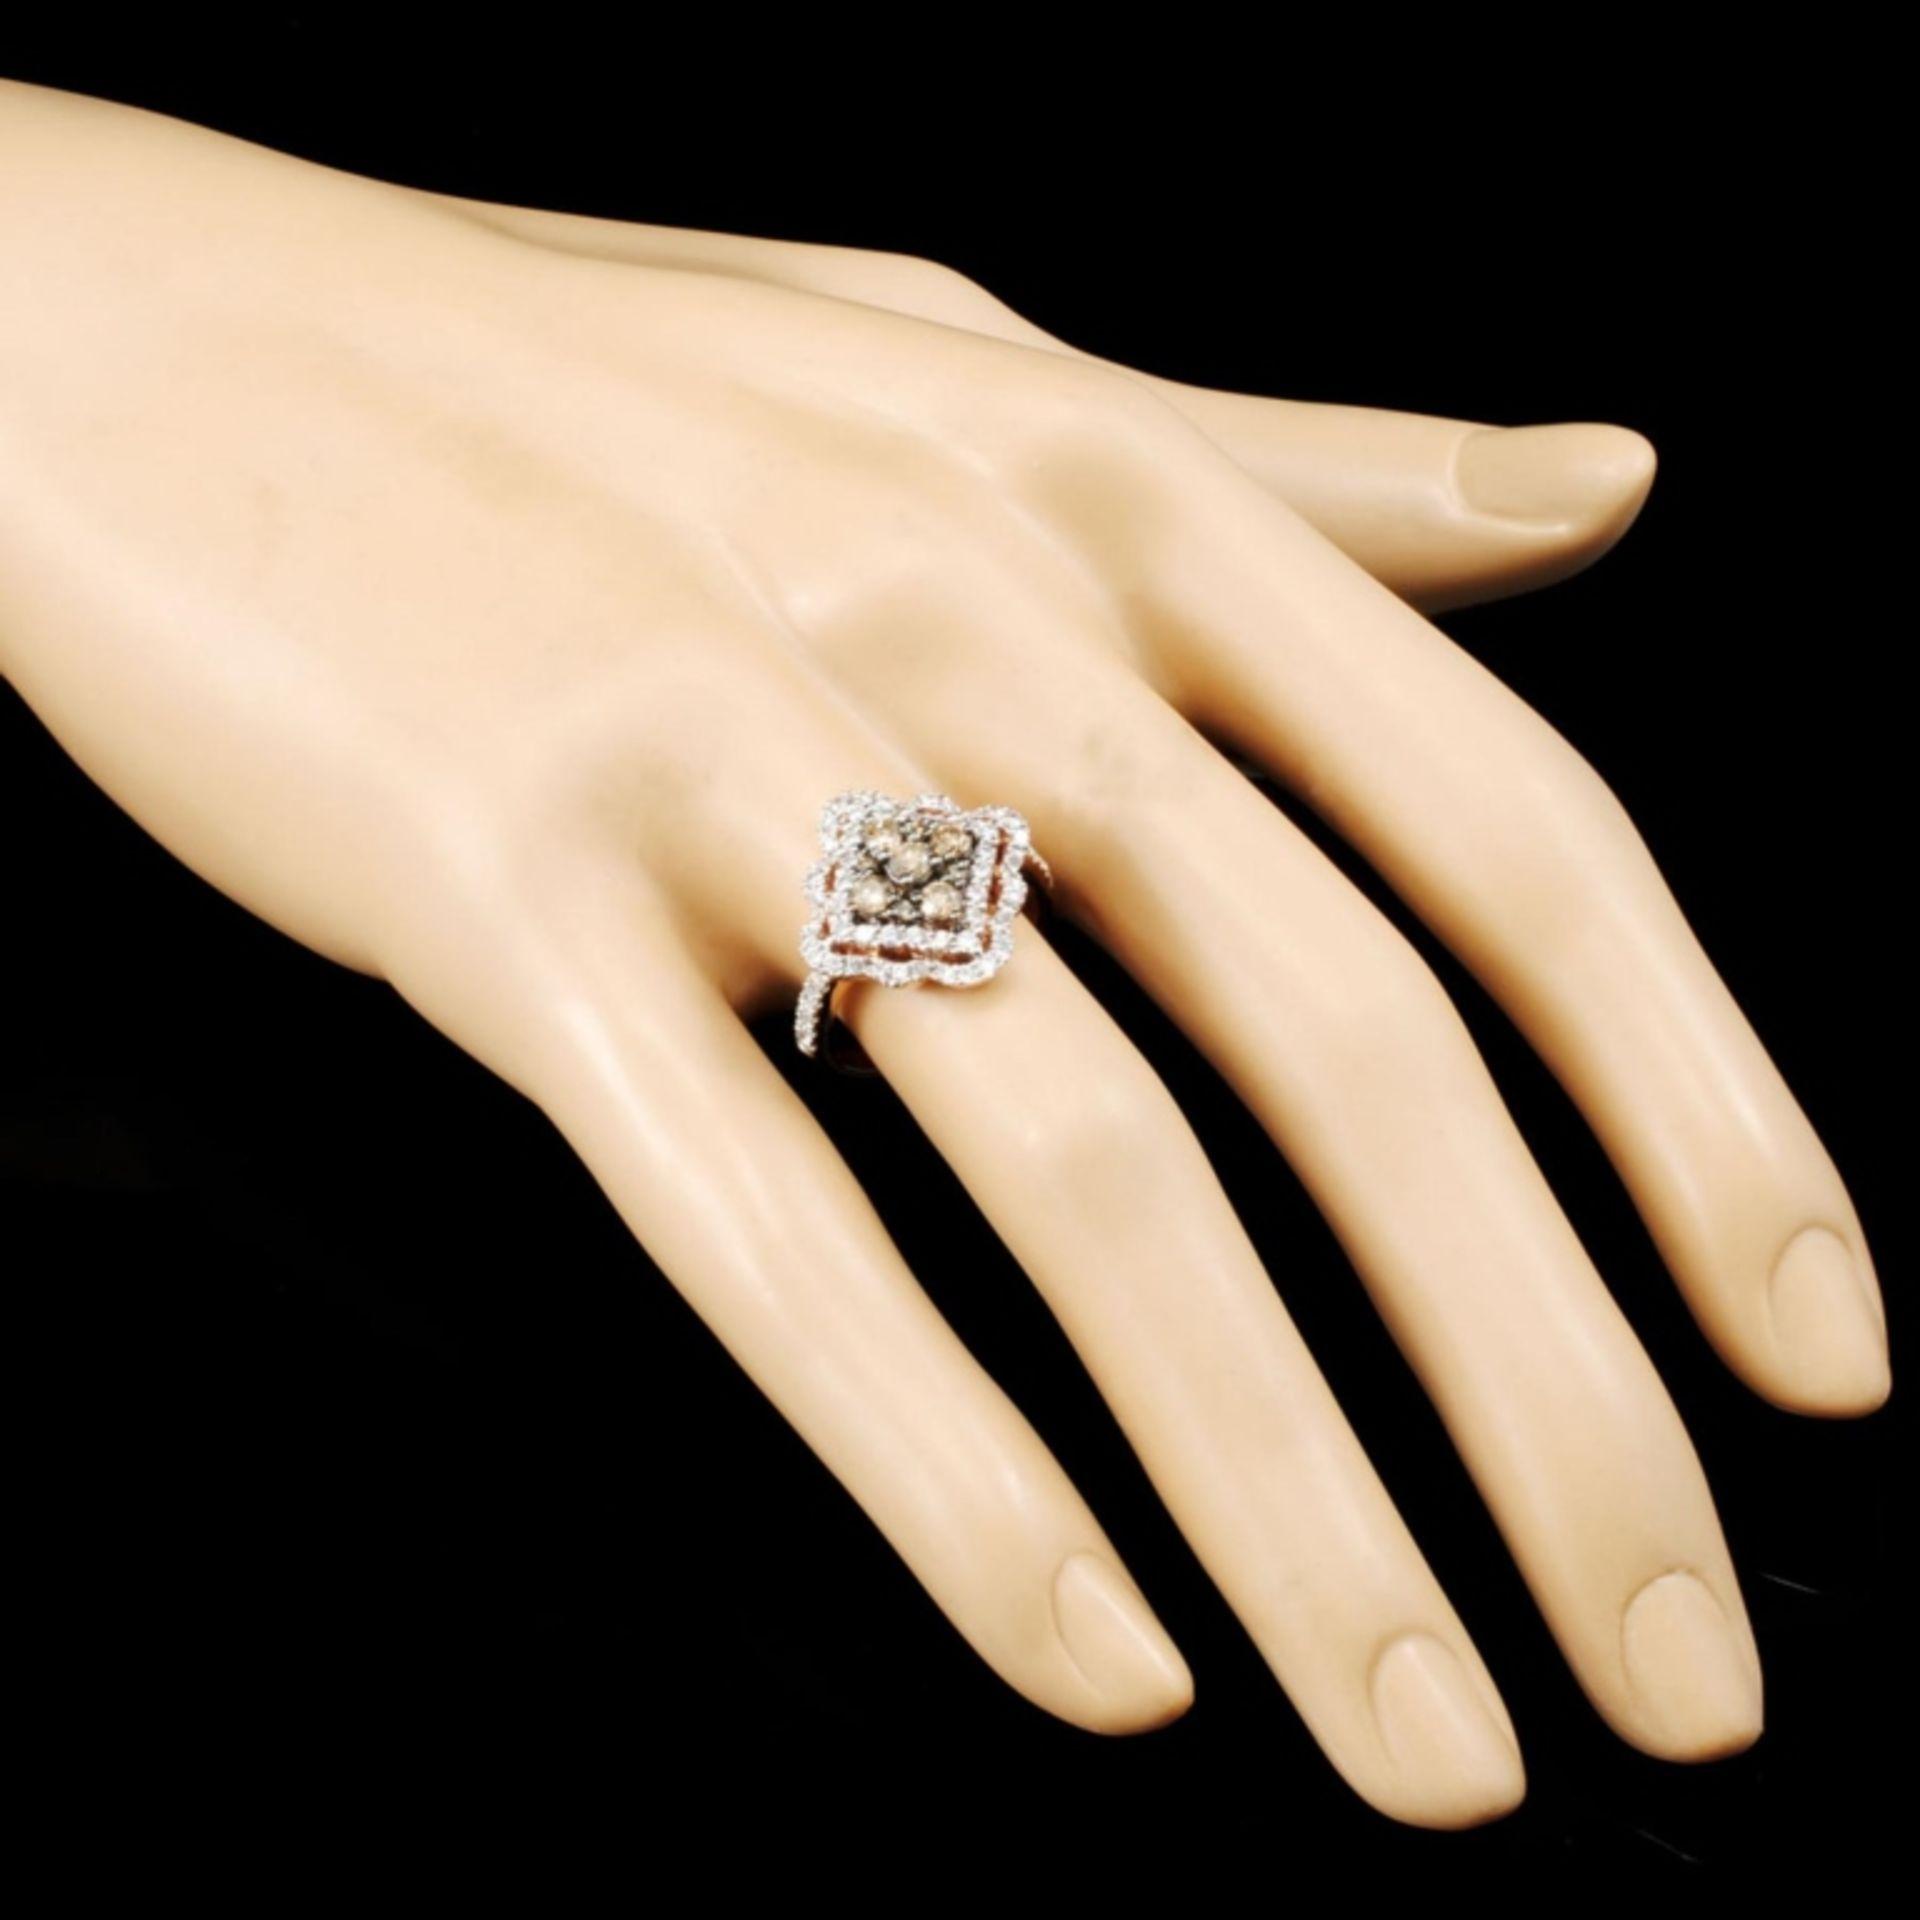 14K Gold 1.19ctw Diamond Ring - Image 3 of 5